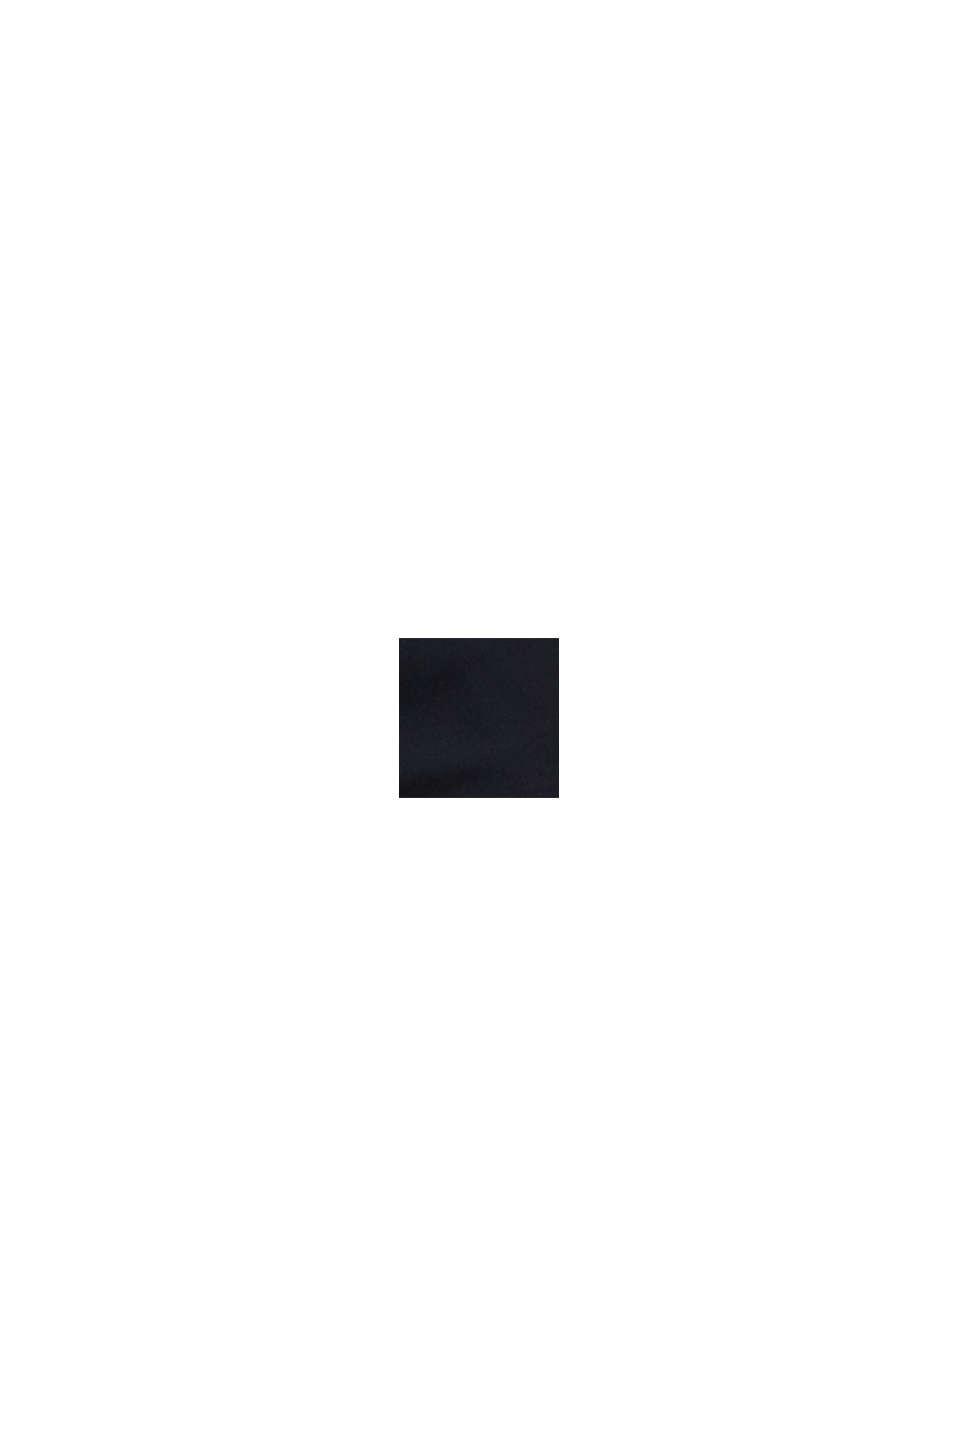 GALONSTRIPE Mix + match stretchbyxa, BLACK, swatch